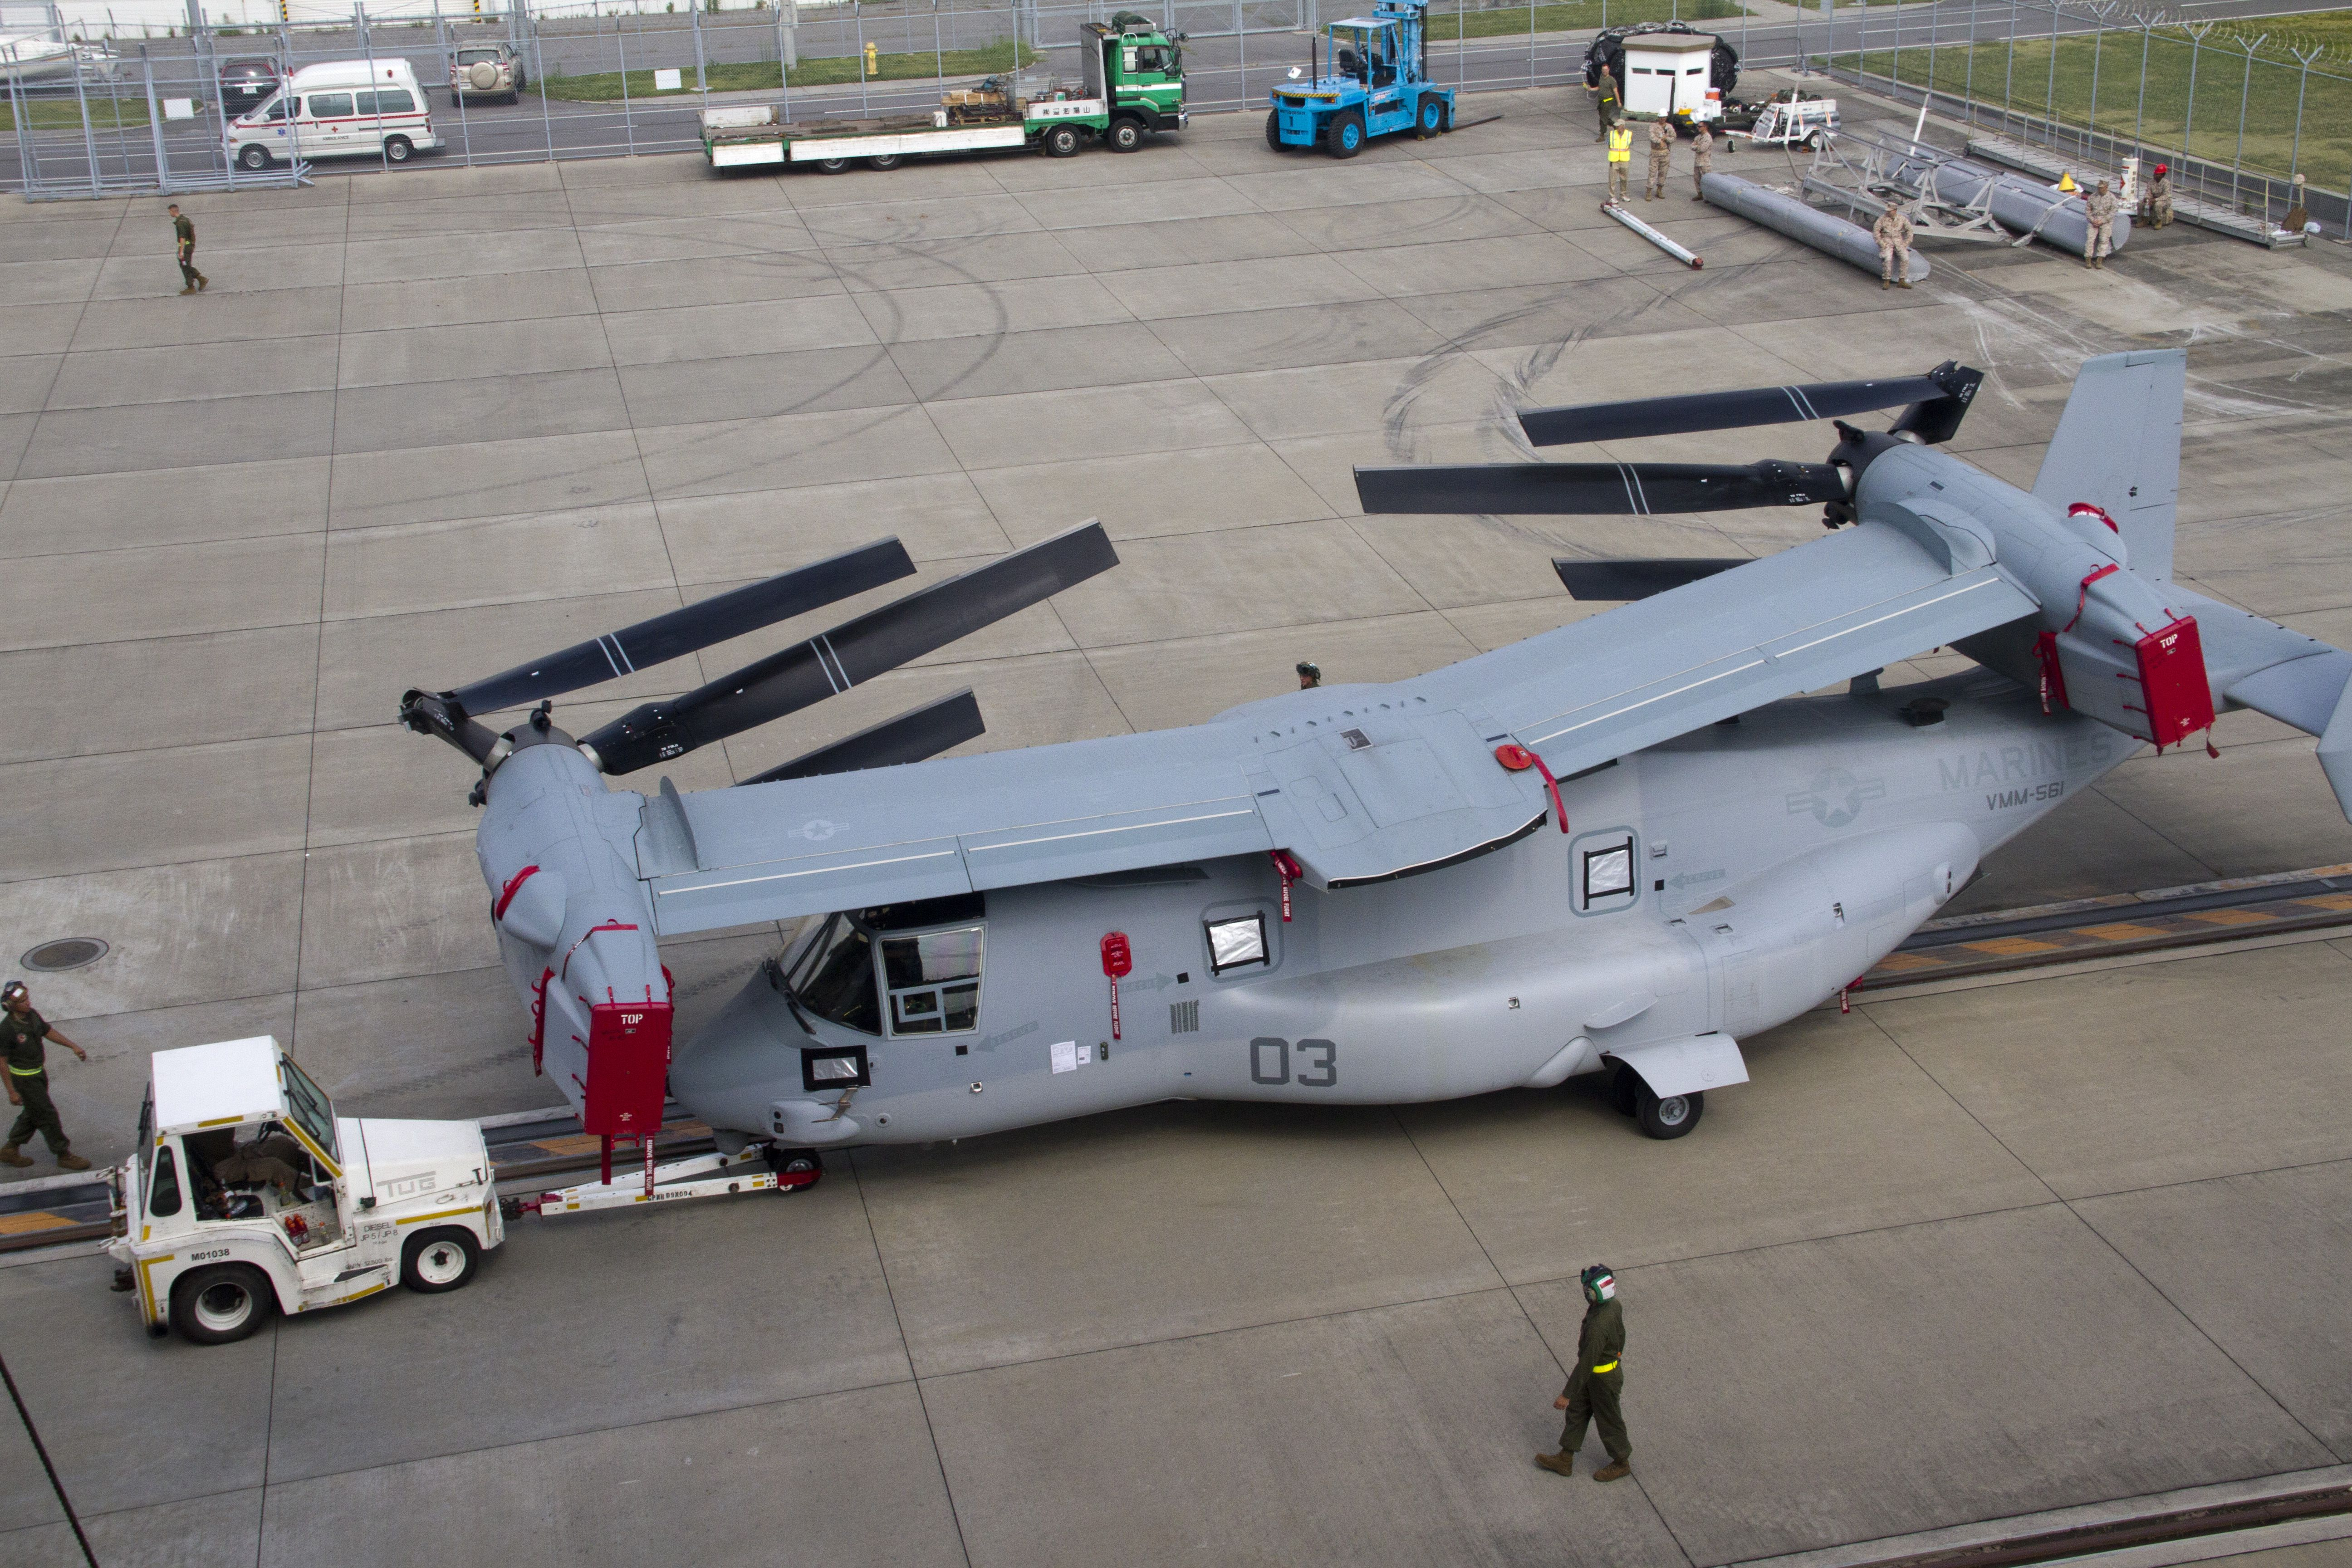 mv 22b osprey fold up aeroplane airplanes and helicopters rh pinterest com v-22 osprey technical manual v-22 osprey maintenance manual